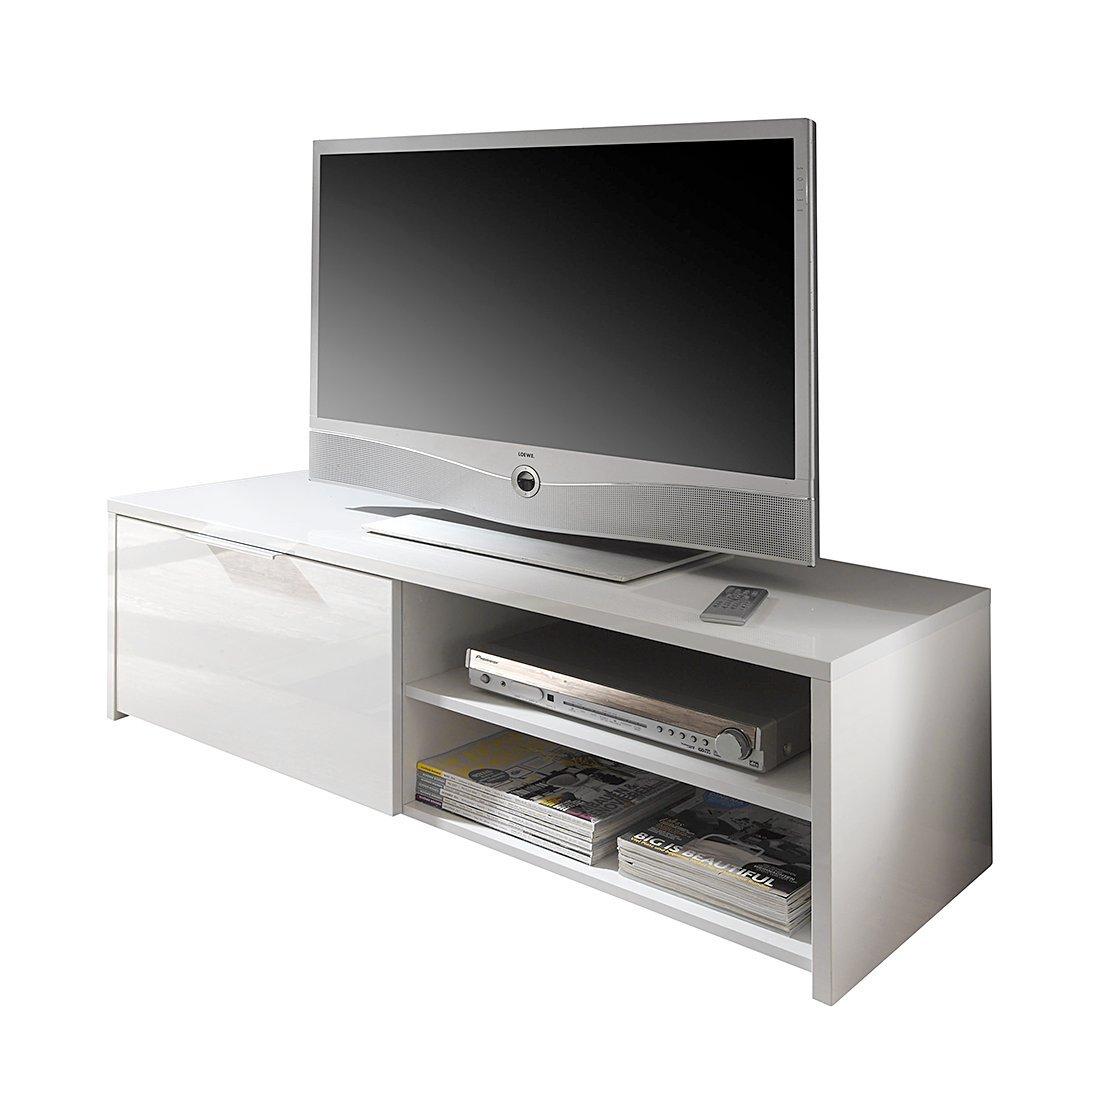 monolocale 25 mq ikea. Black Bedroom Furniture Sets. Home Design Ideas